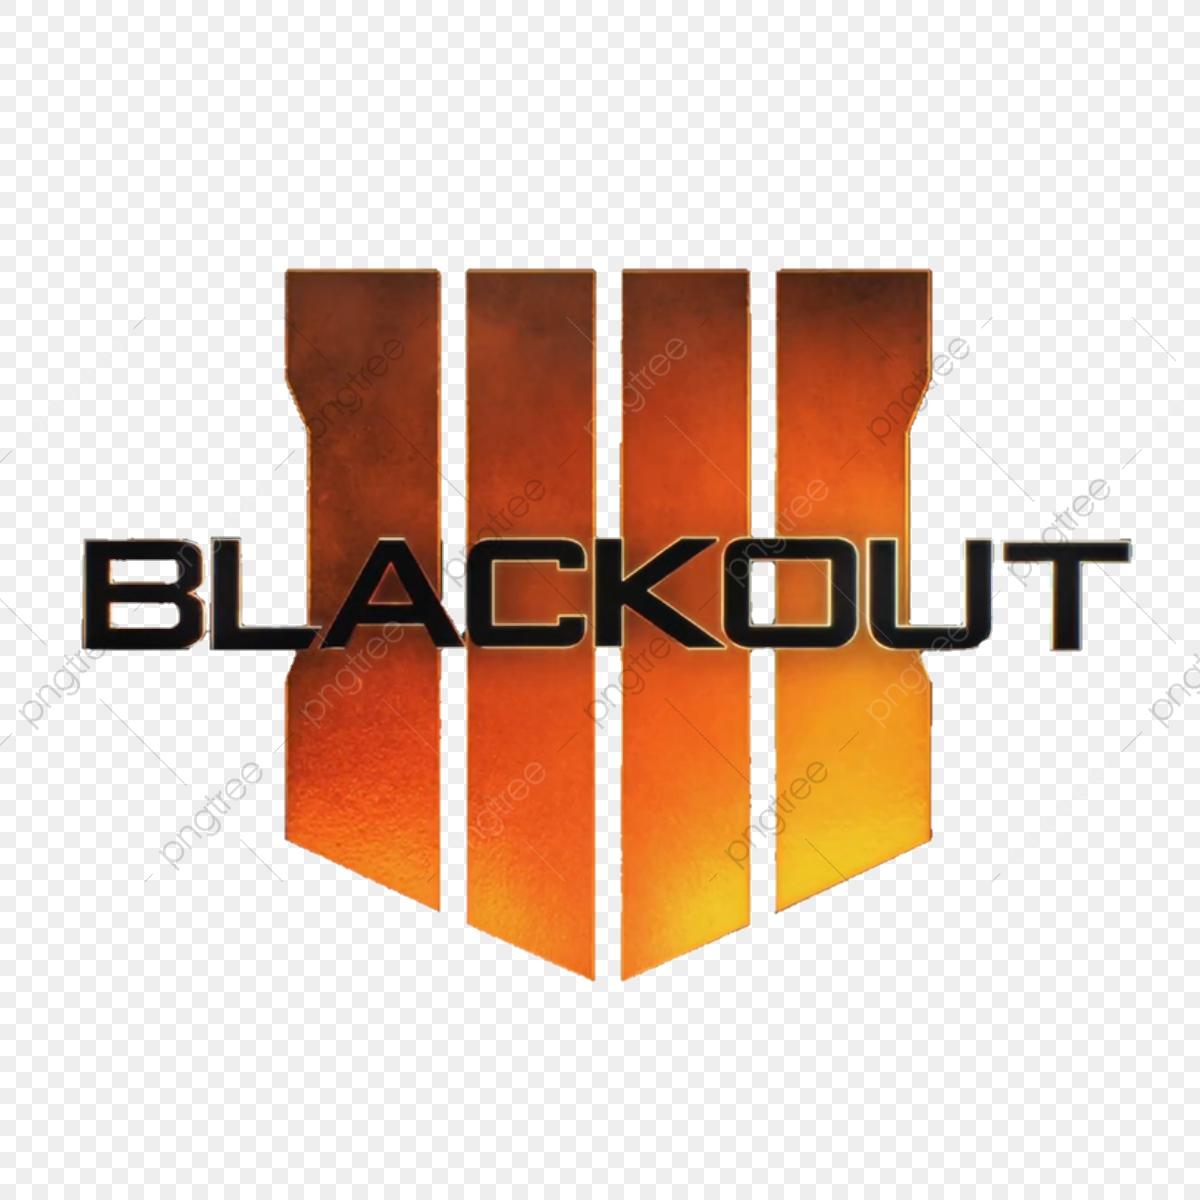 Call Of Duty Black Ops 4 Blackout Logo, Call Of Duty, Blackout Logo.